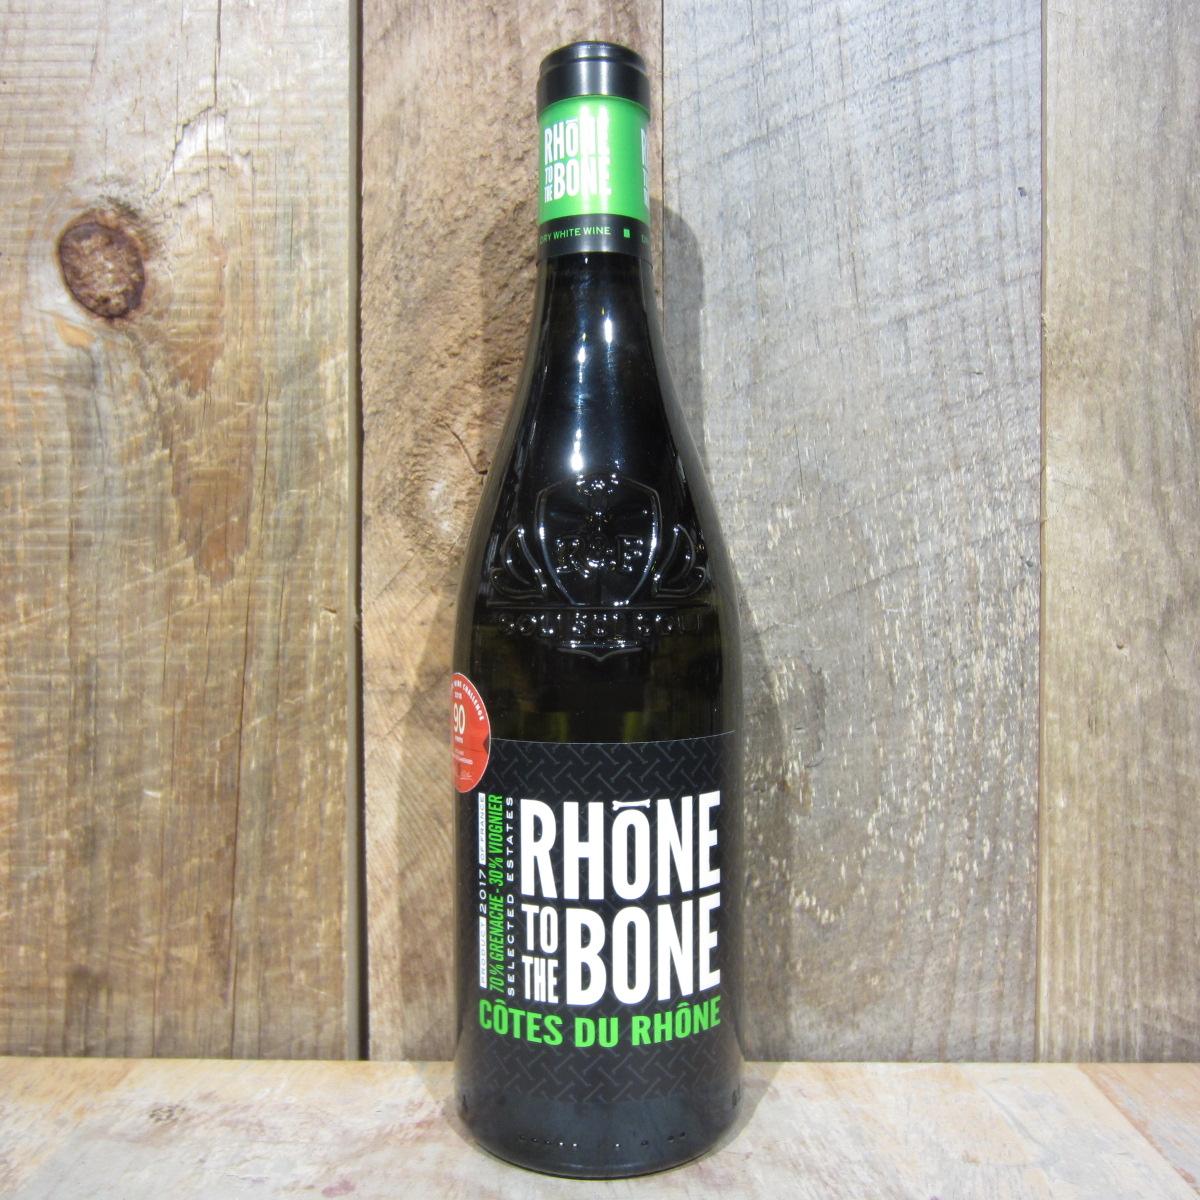 Rhone to The Bone Cotes du Rhone White 750ml